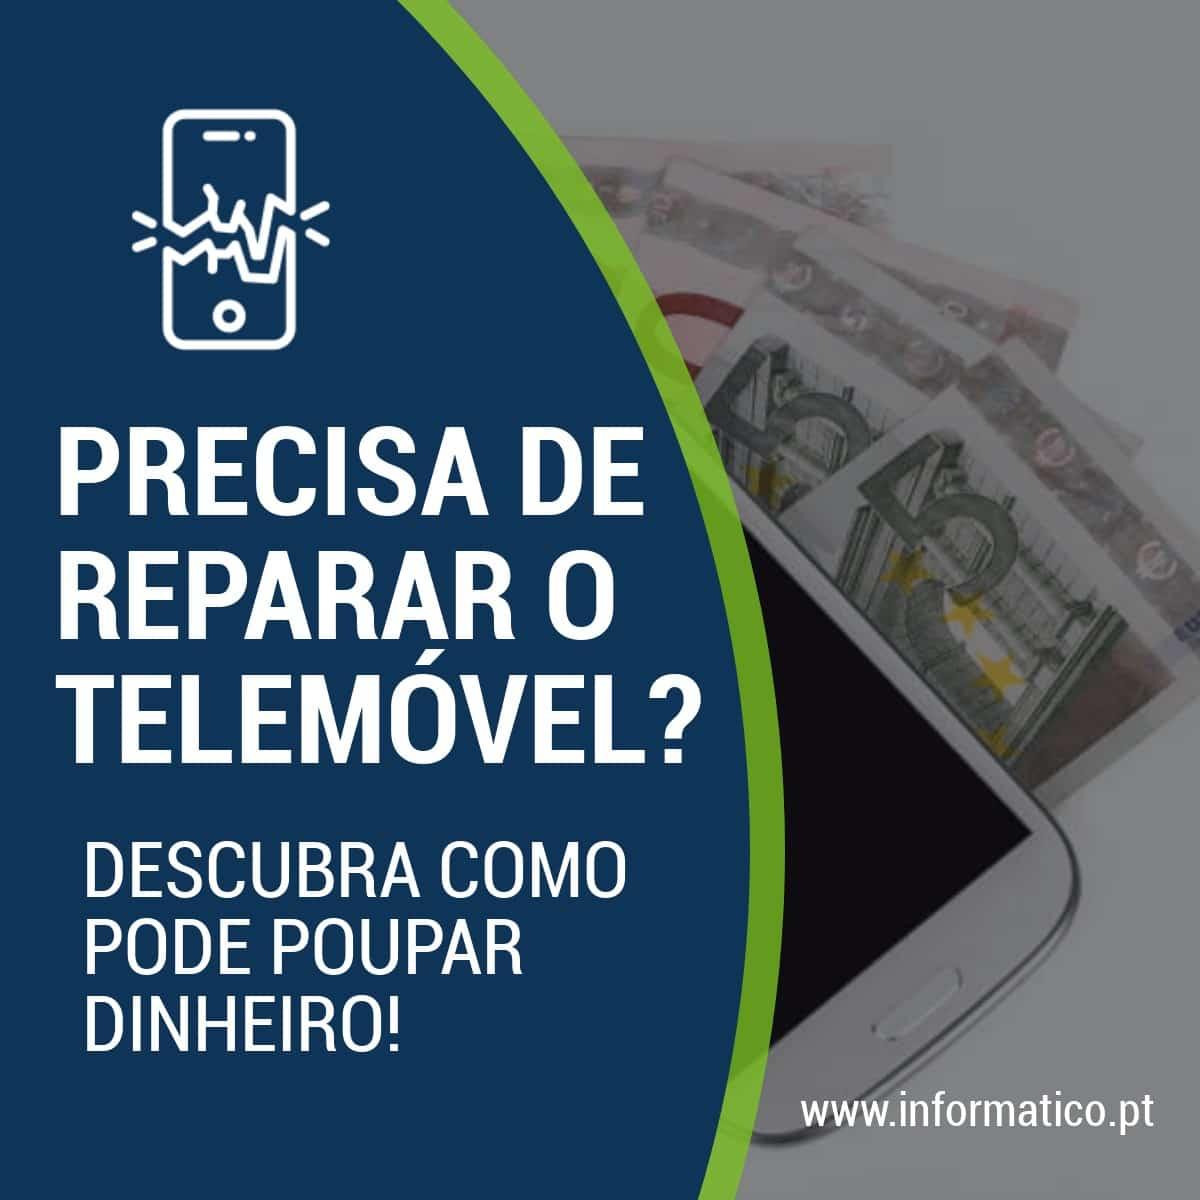 reparar telemóvel lamego